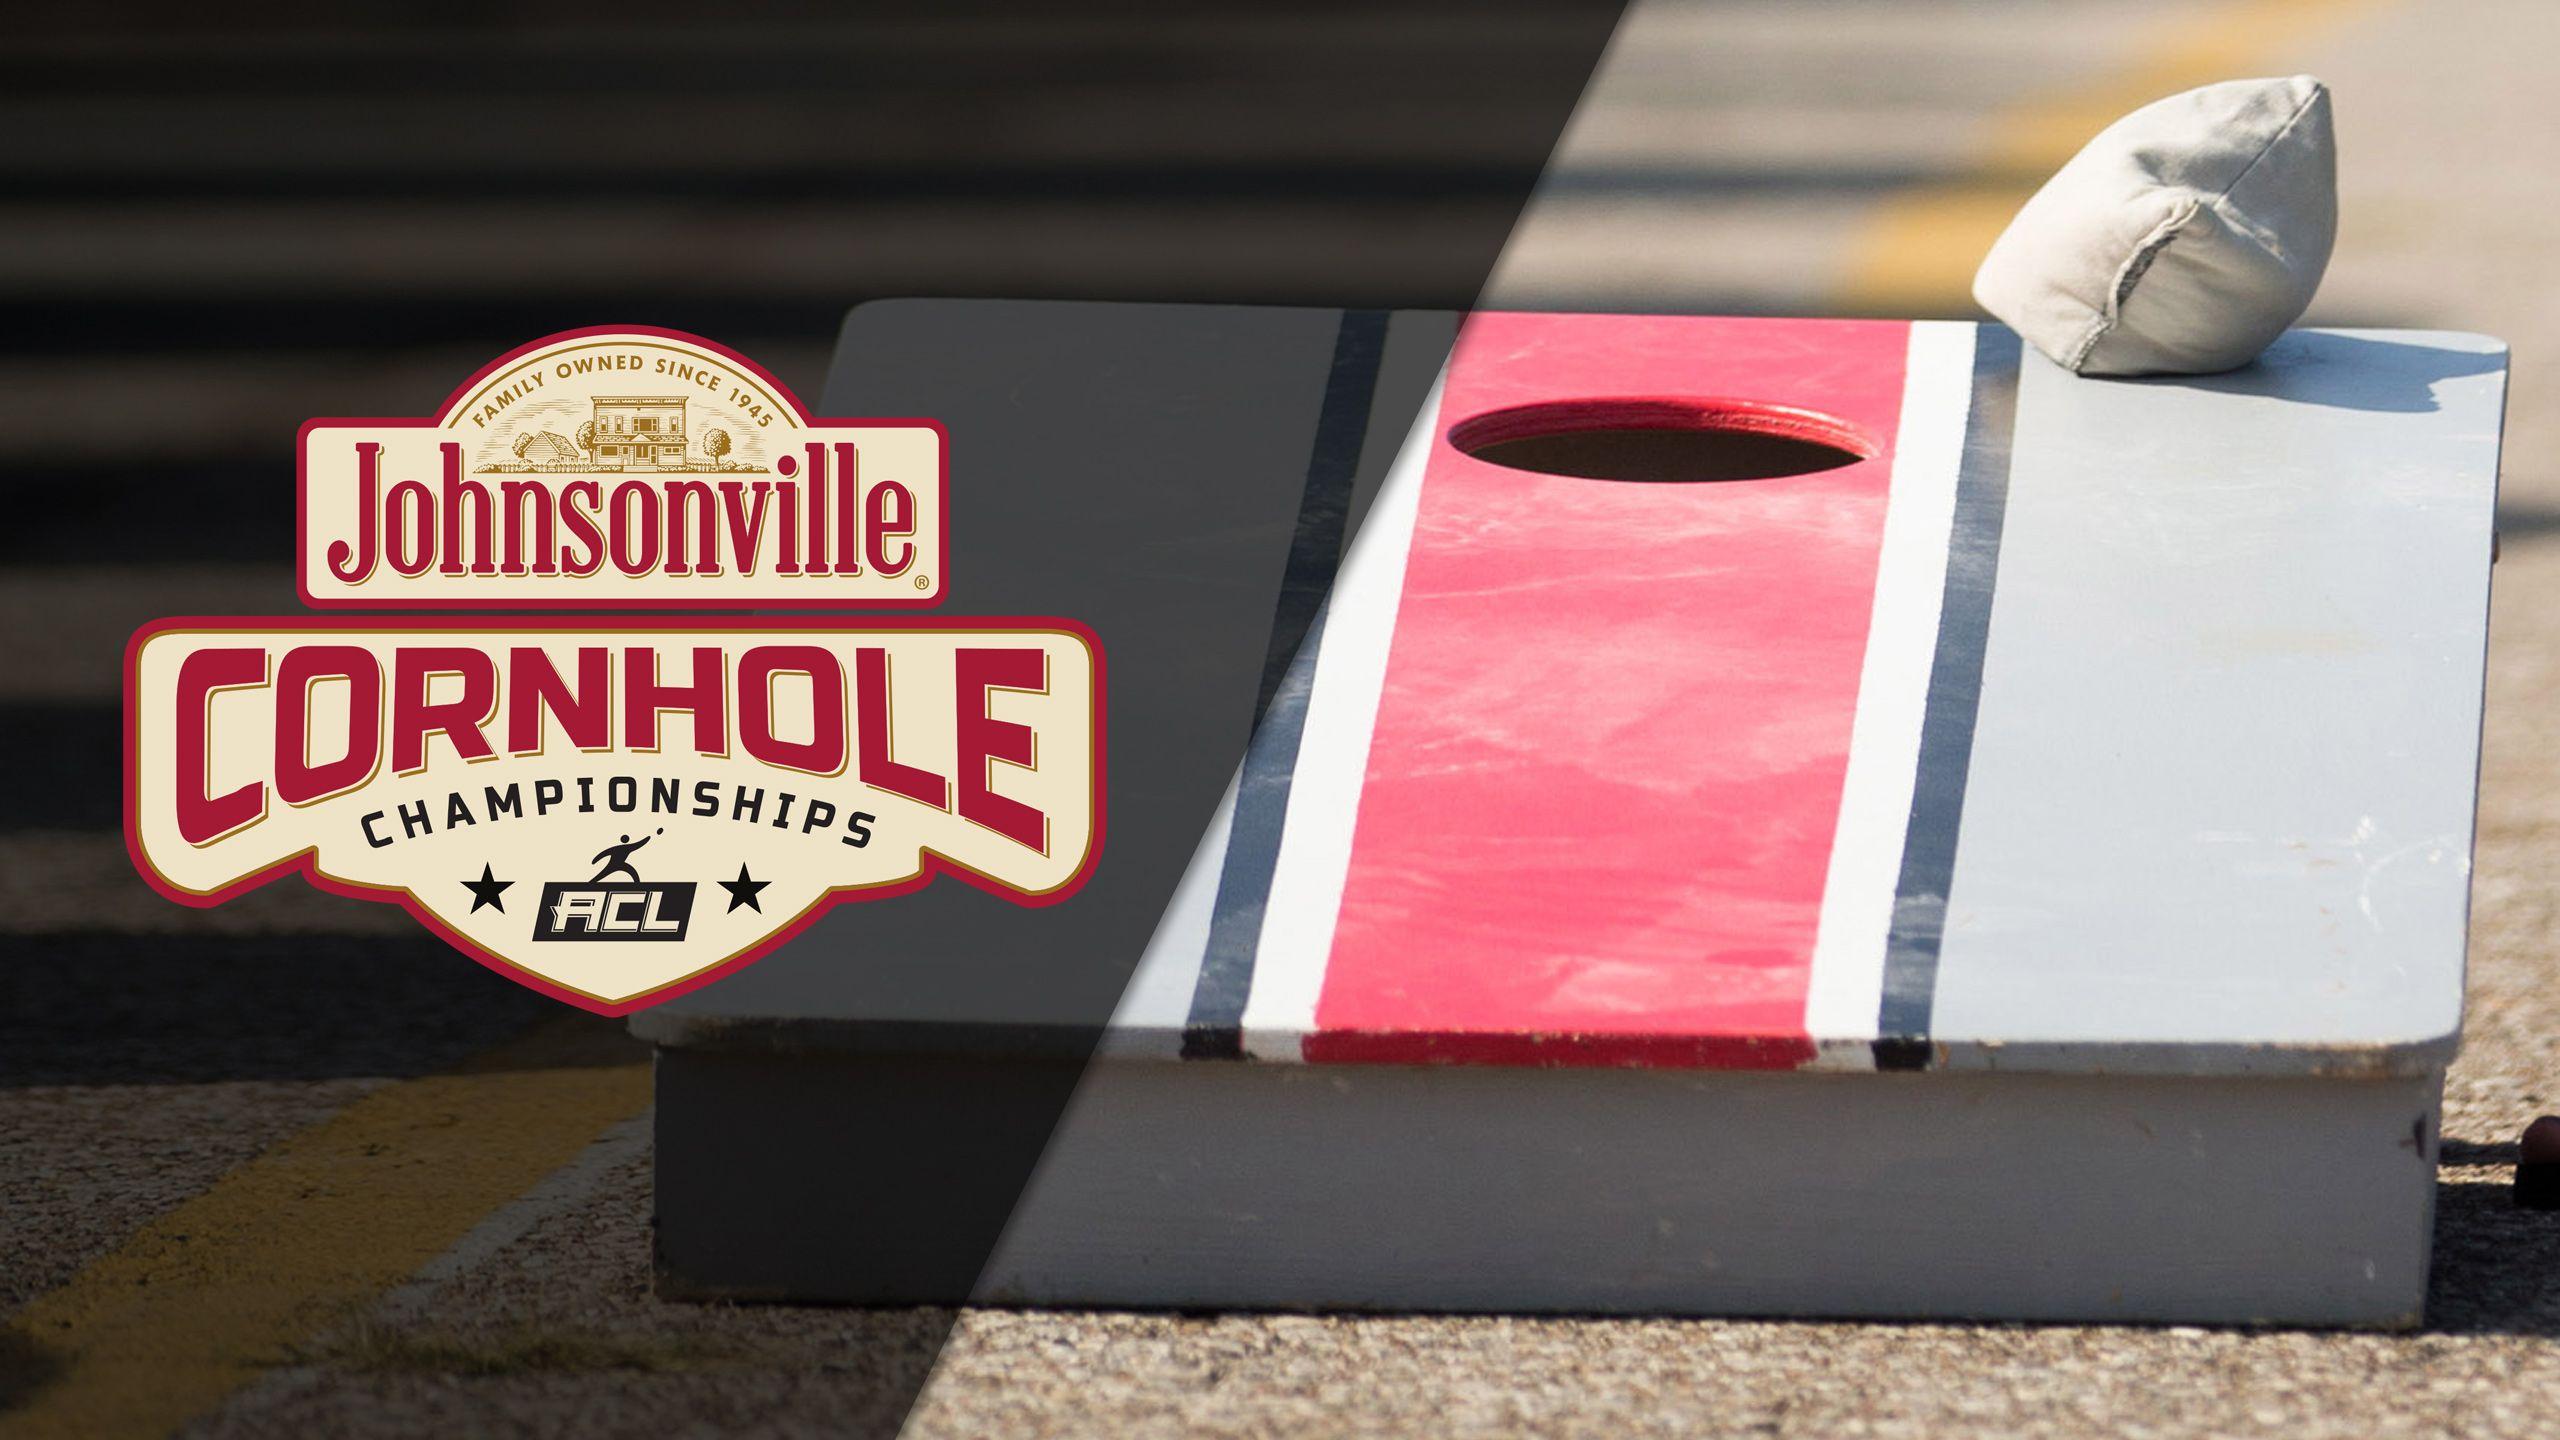 Johnsonville Cornhole Championships: ACL Cornhole Mania